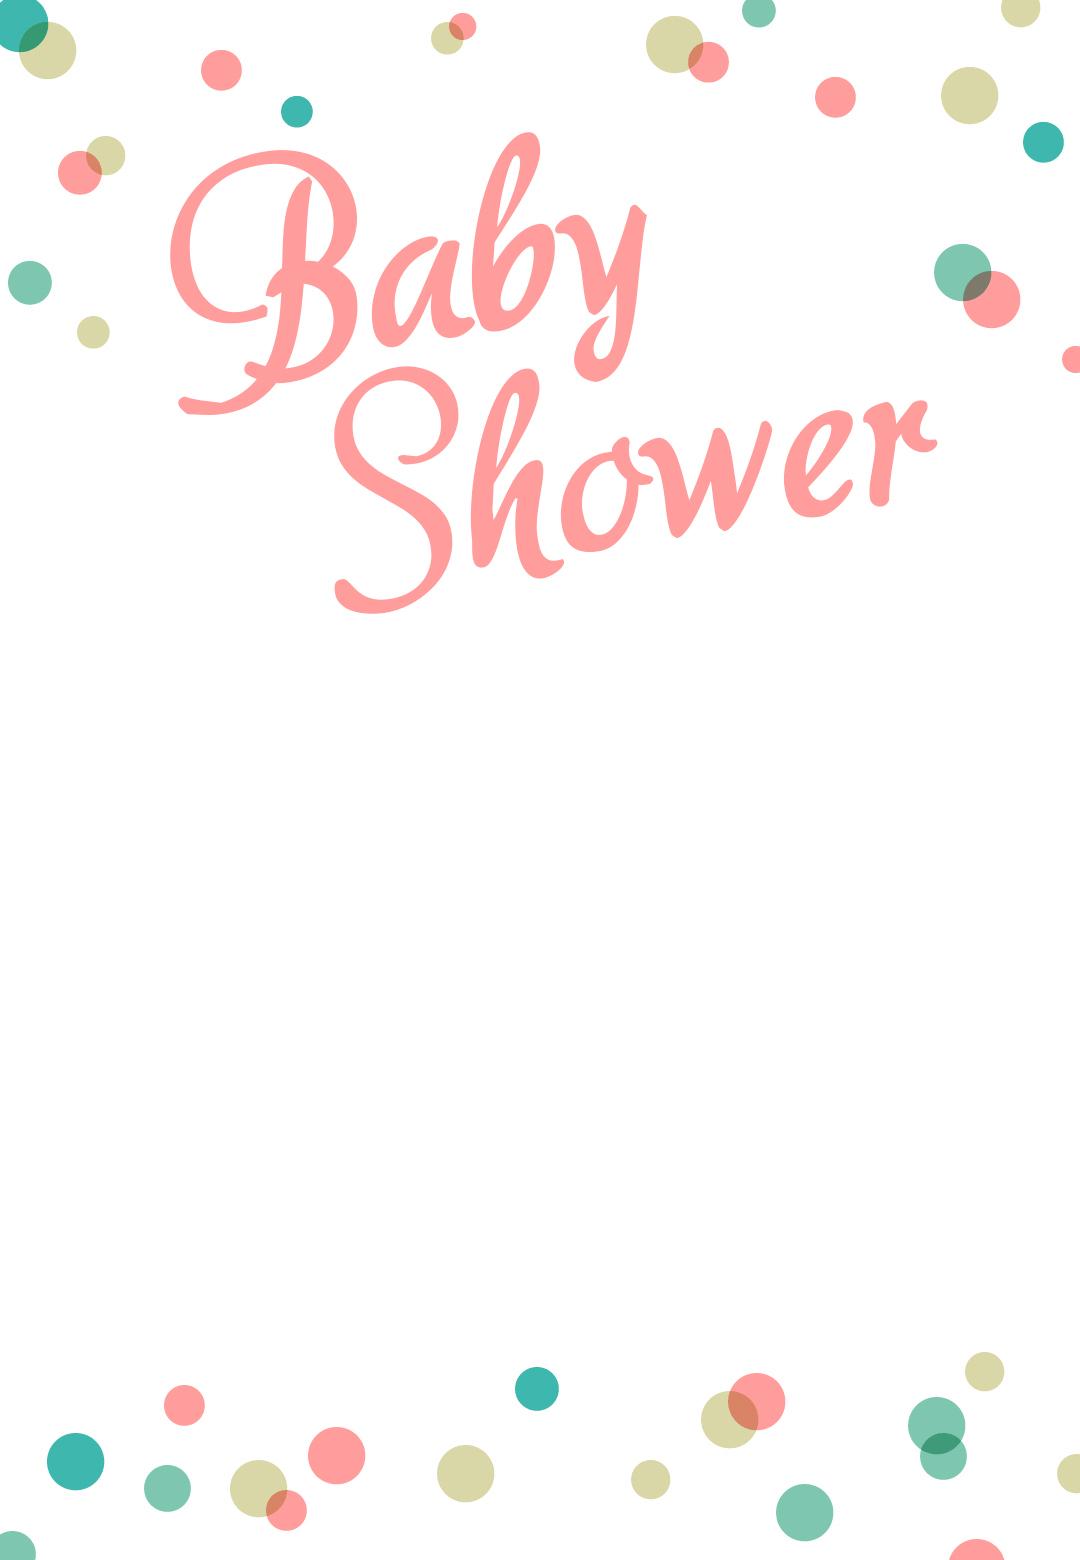 Dancing Dots Borders - Free Printable Baby Shower Invitation - Free Printable Blank Baby Shower Invitations